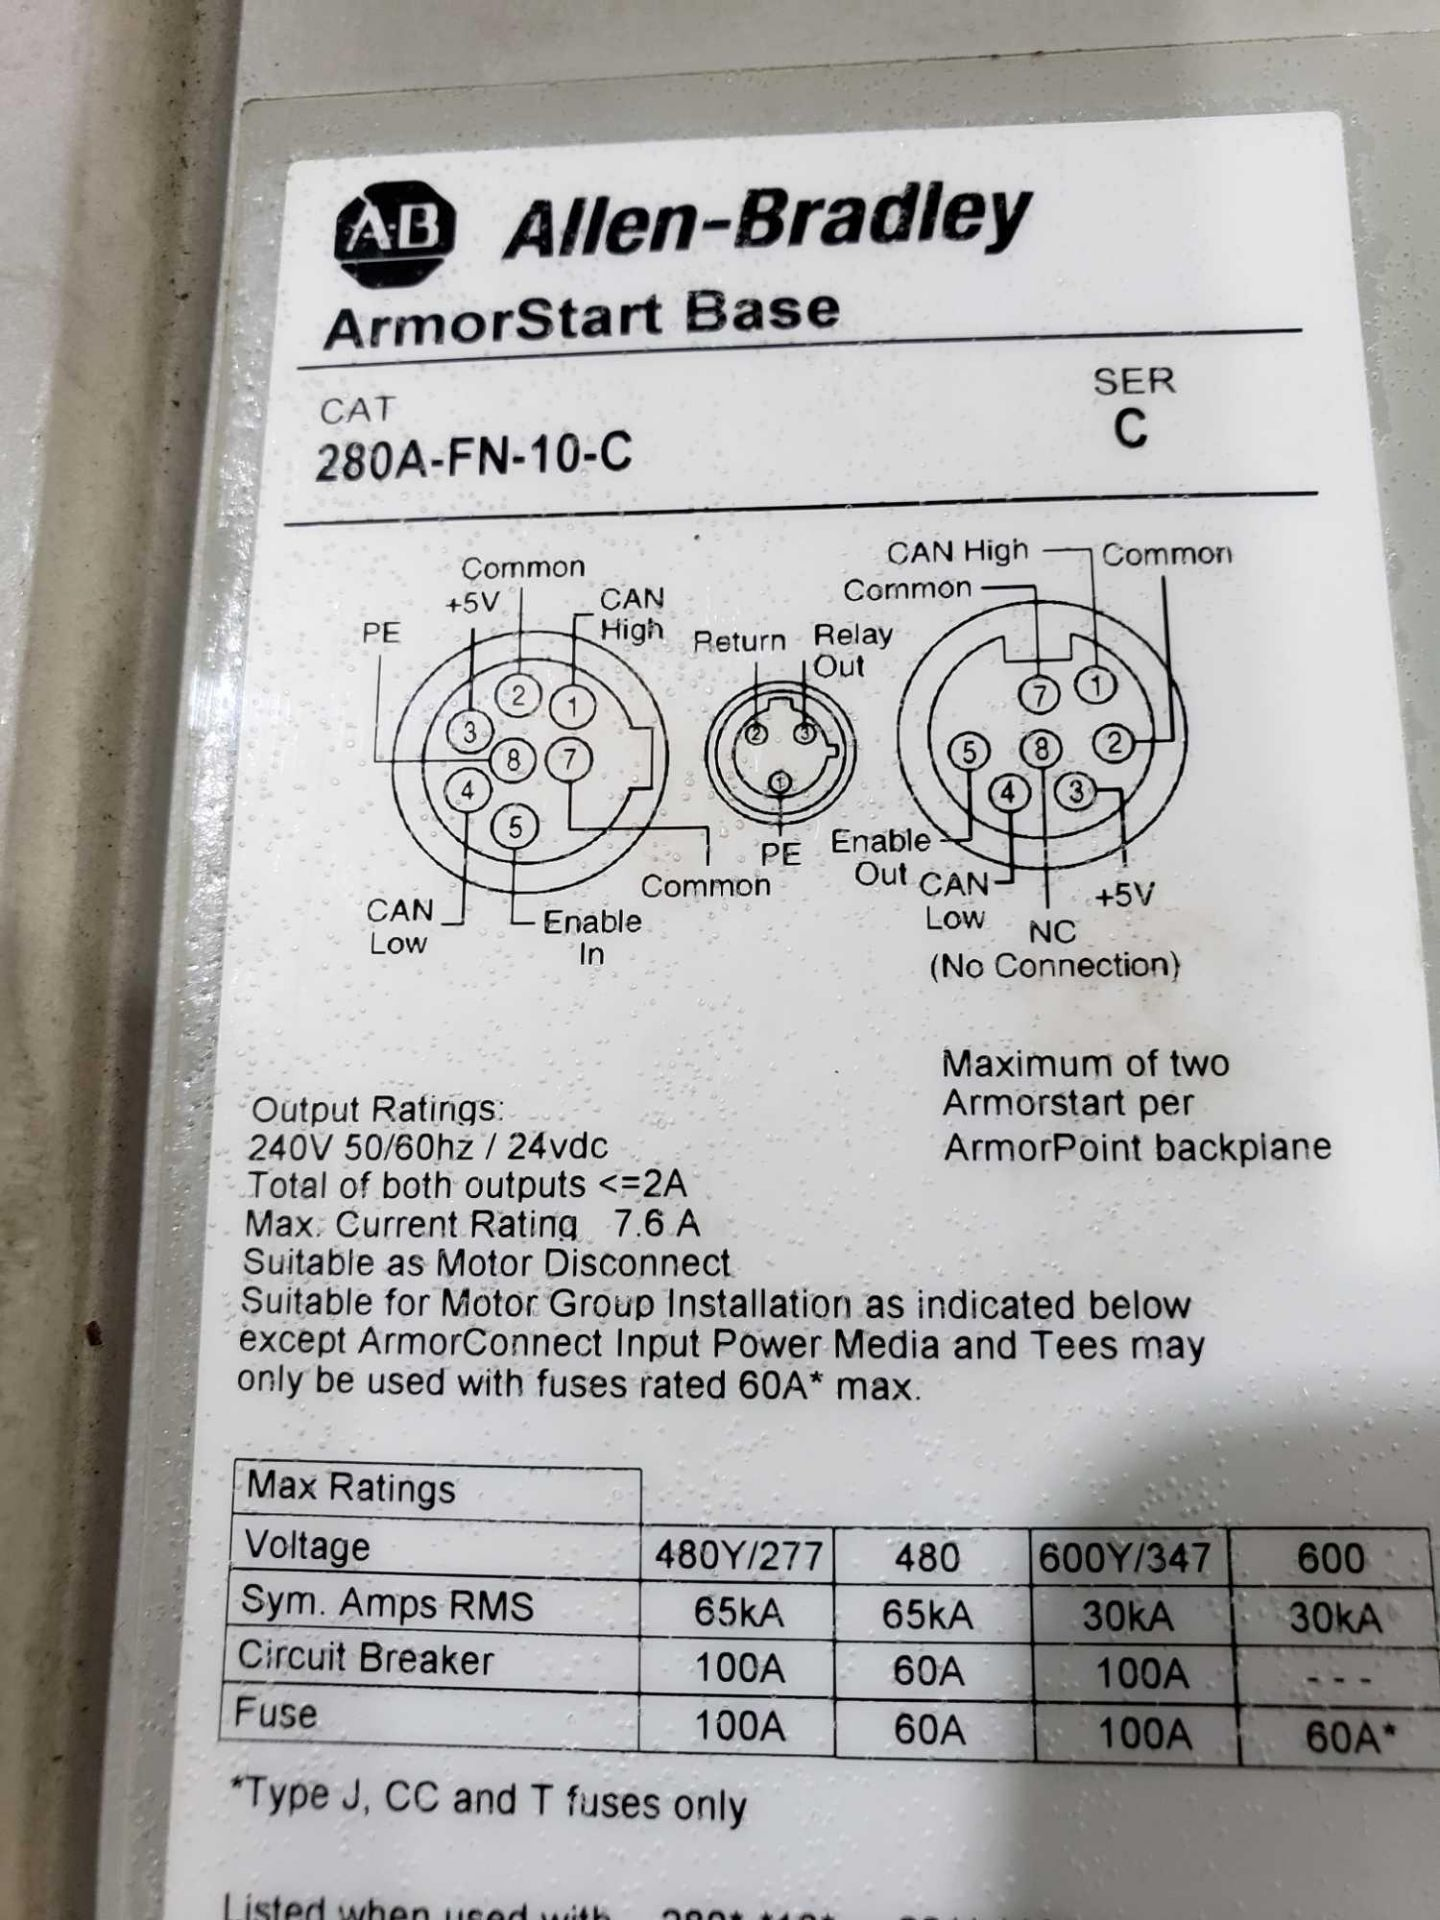 Lot 12 - Allen Bradley Armorstart Catalog 280A-F12Z-10A-CR with base Catalog 280A-FN-10C.